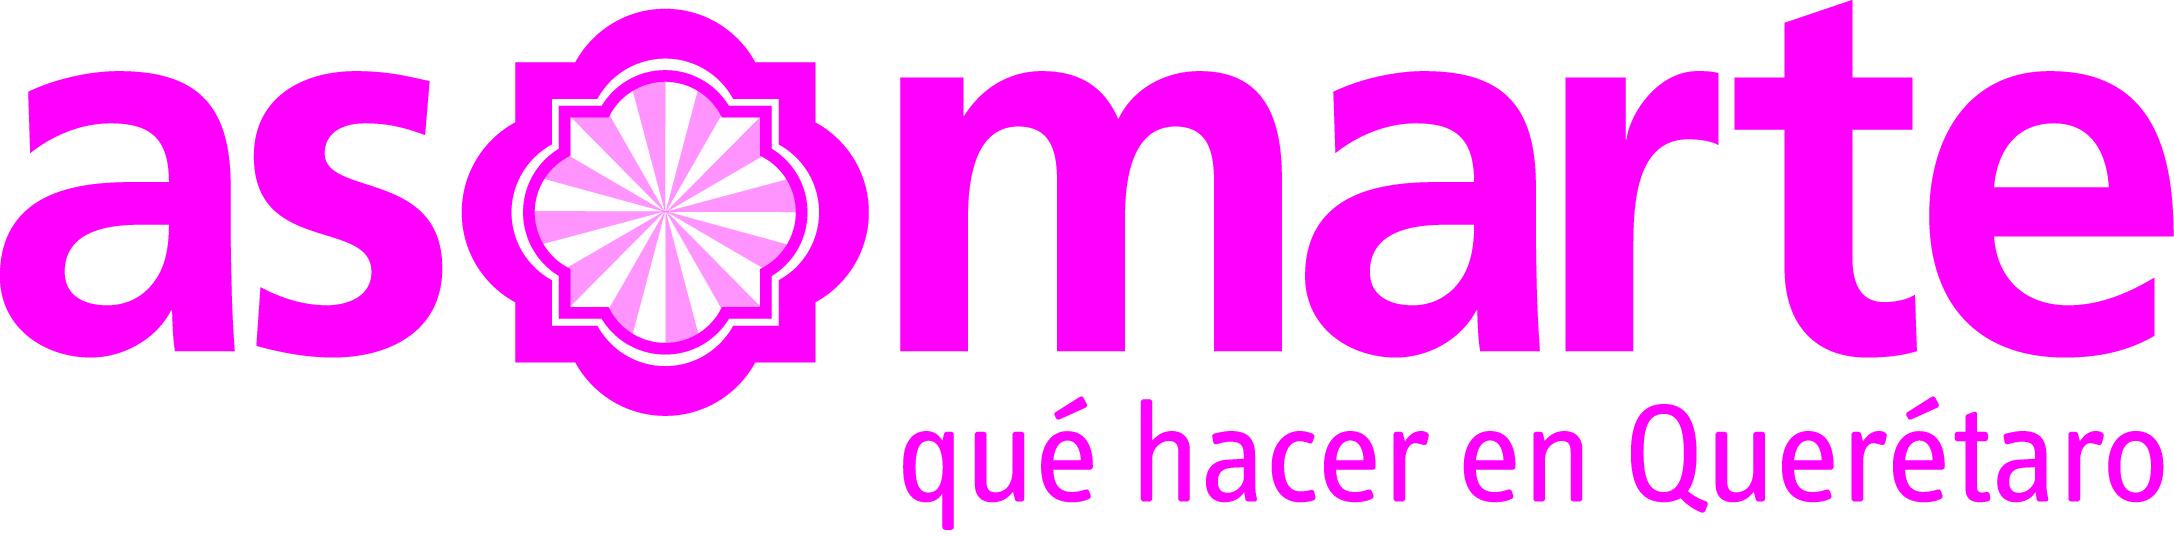 Revista Asomarte Edición Abril 2013 – Diseño Urbano